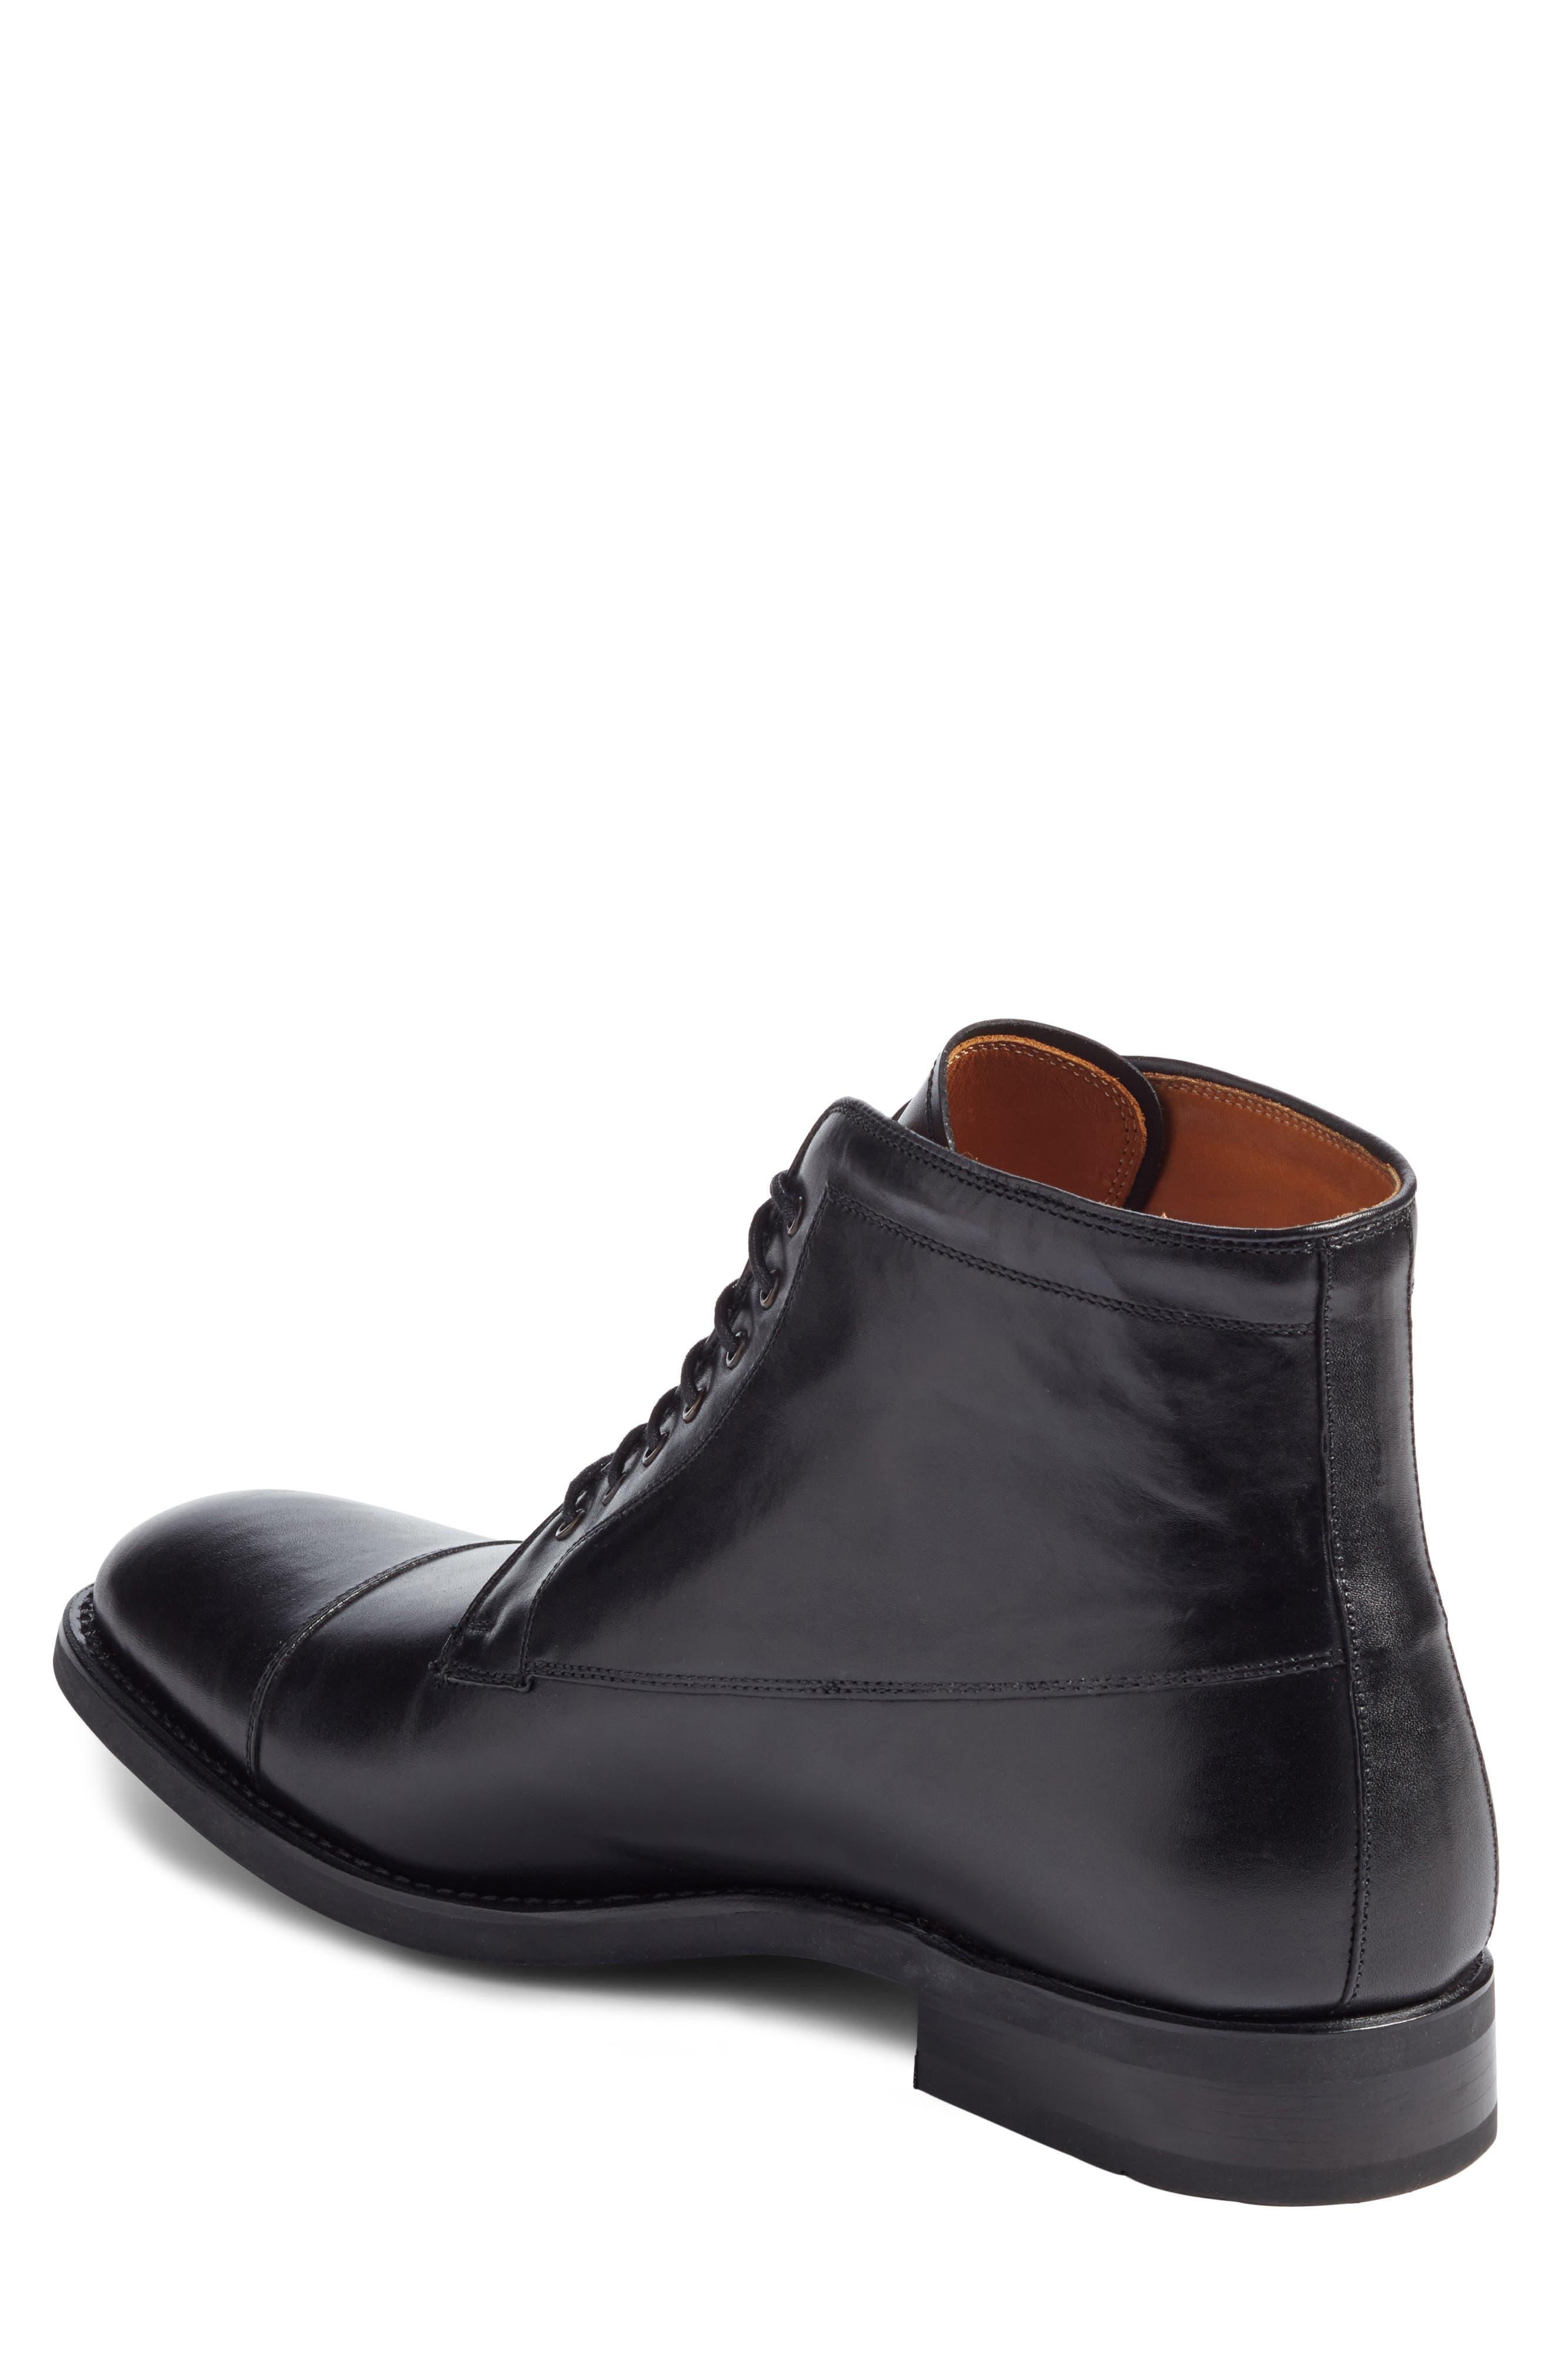 Chester Cap Toe Boot,                             Alternate thumbnail 2, color,                             Black Leather